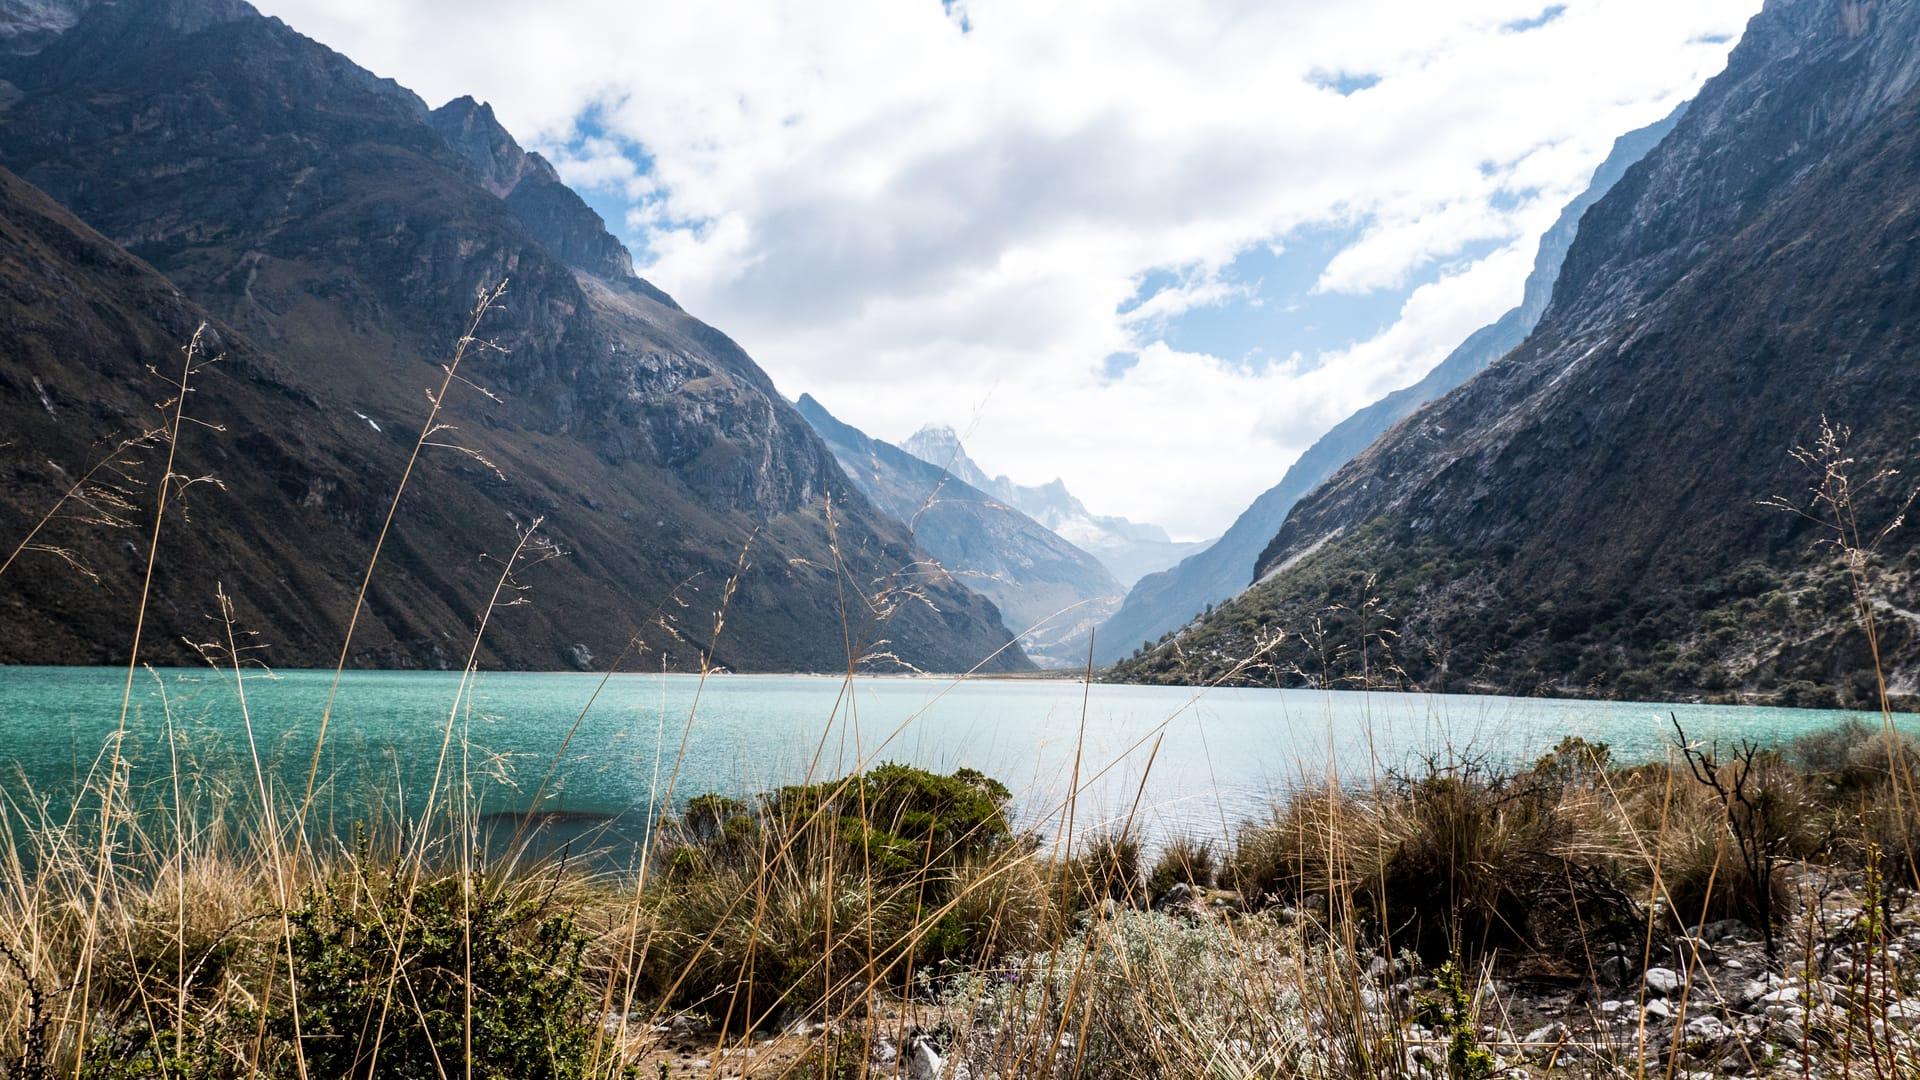 The Santa Cruz Trek in Huaraz - The View Across a Blue Lake